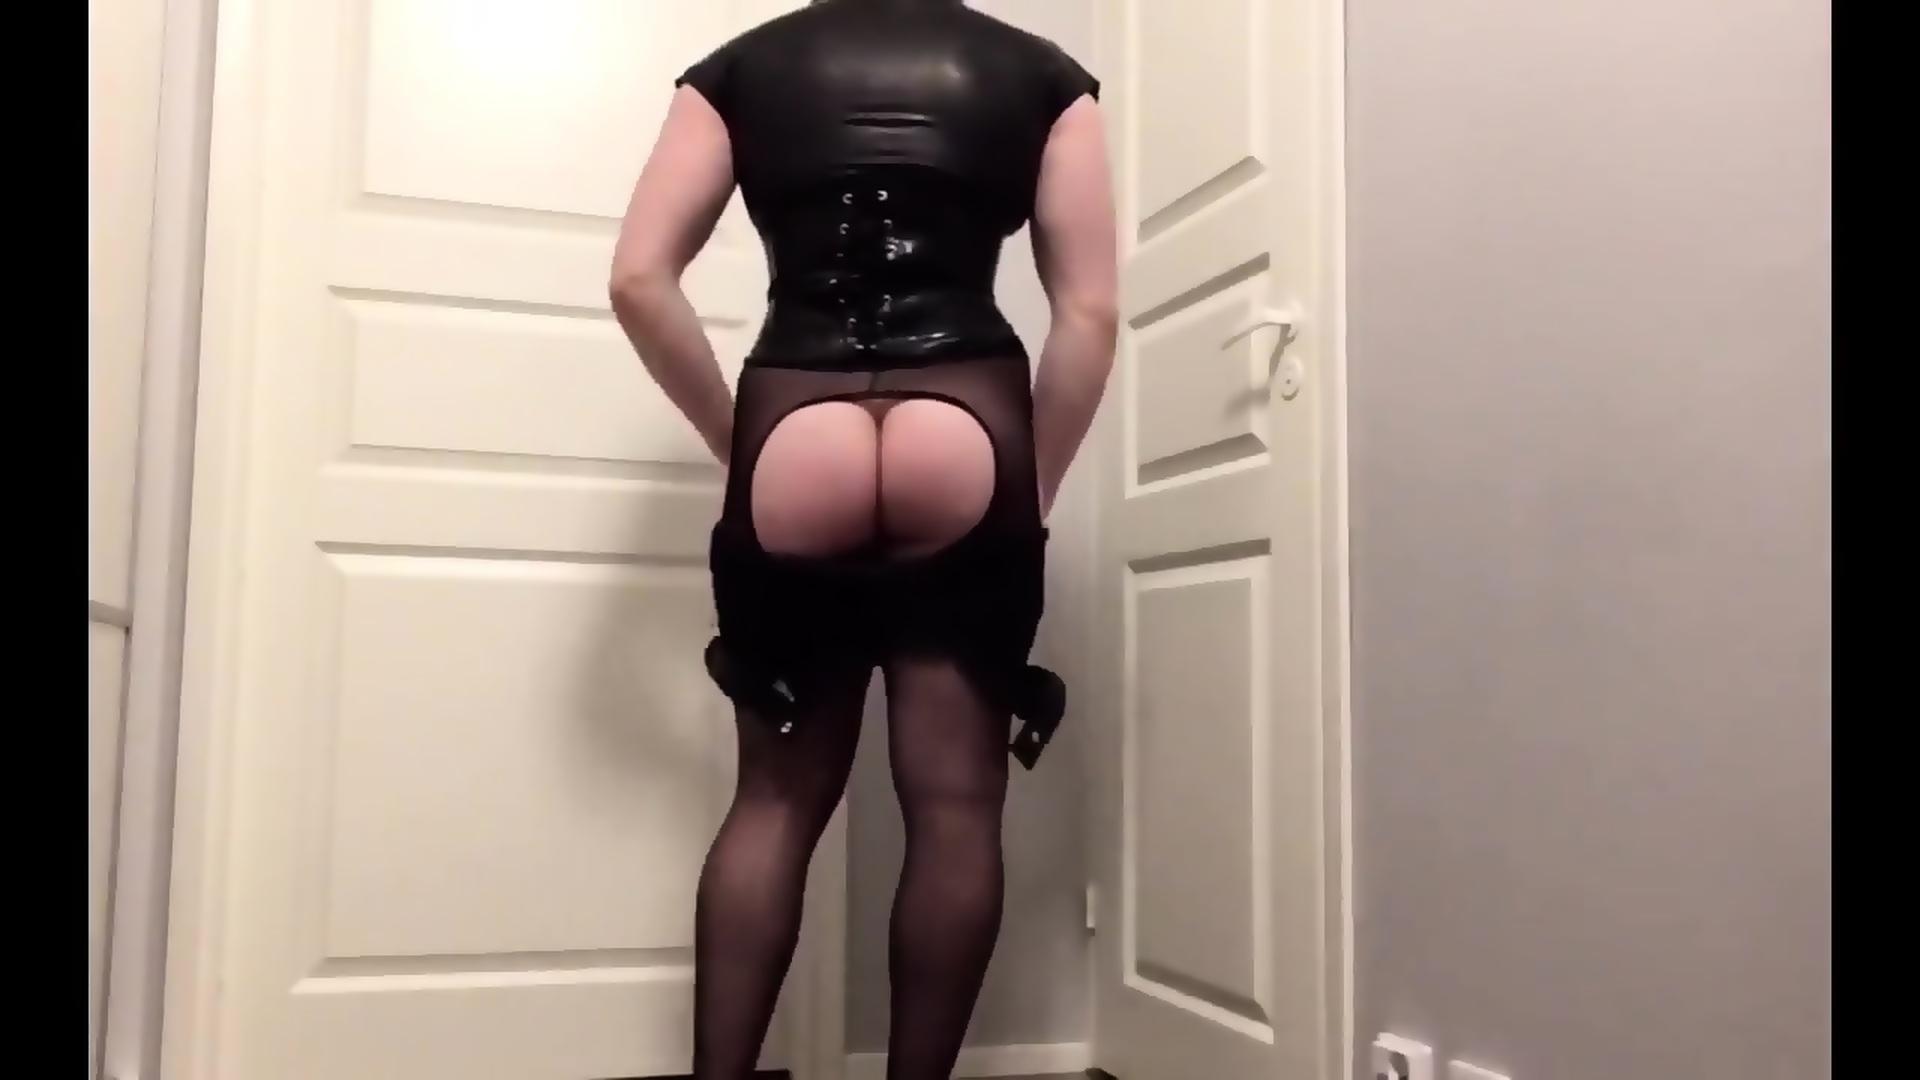 Porn tube 2020 Bbw in tight clothing